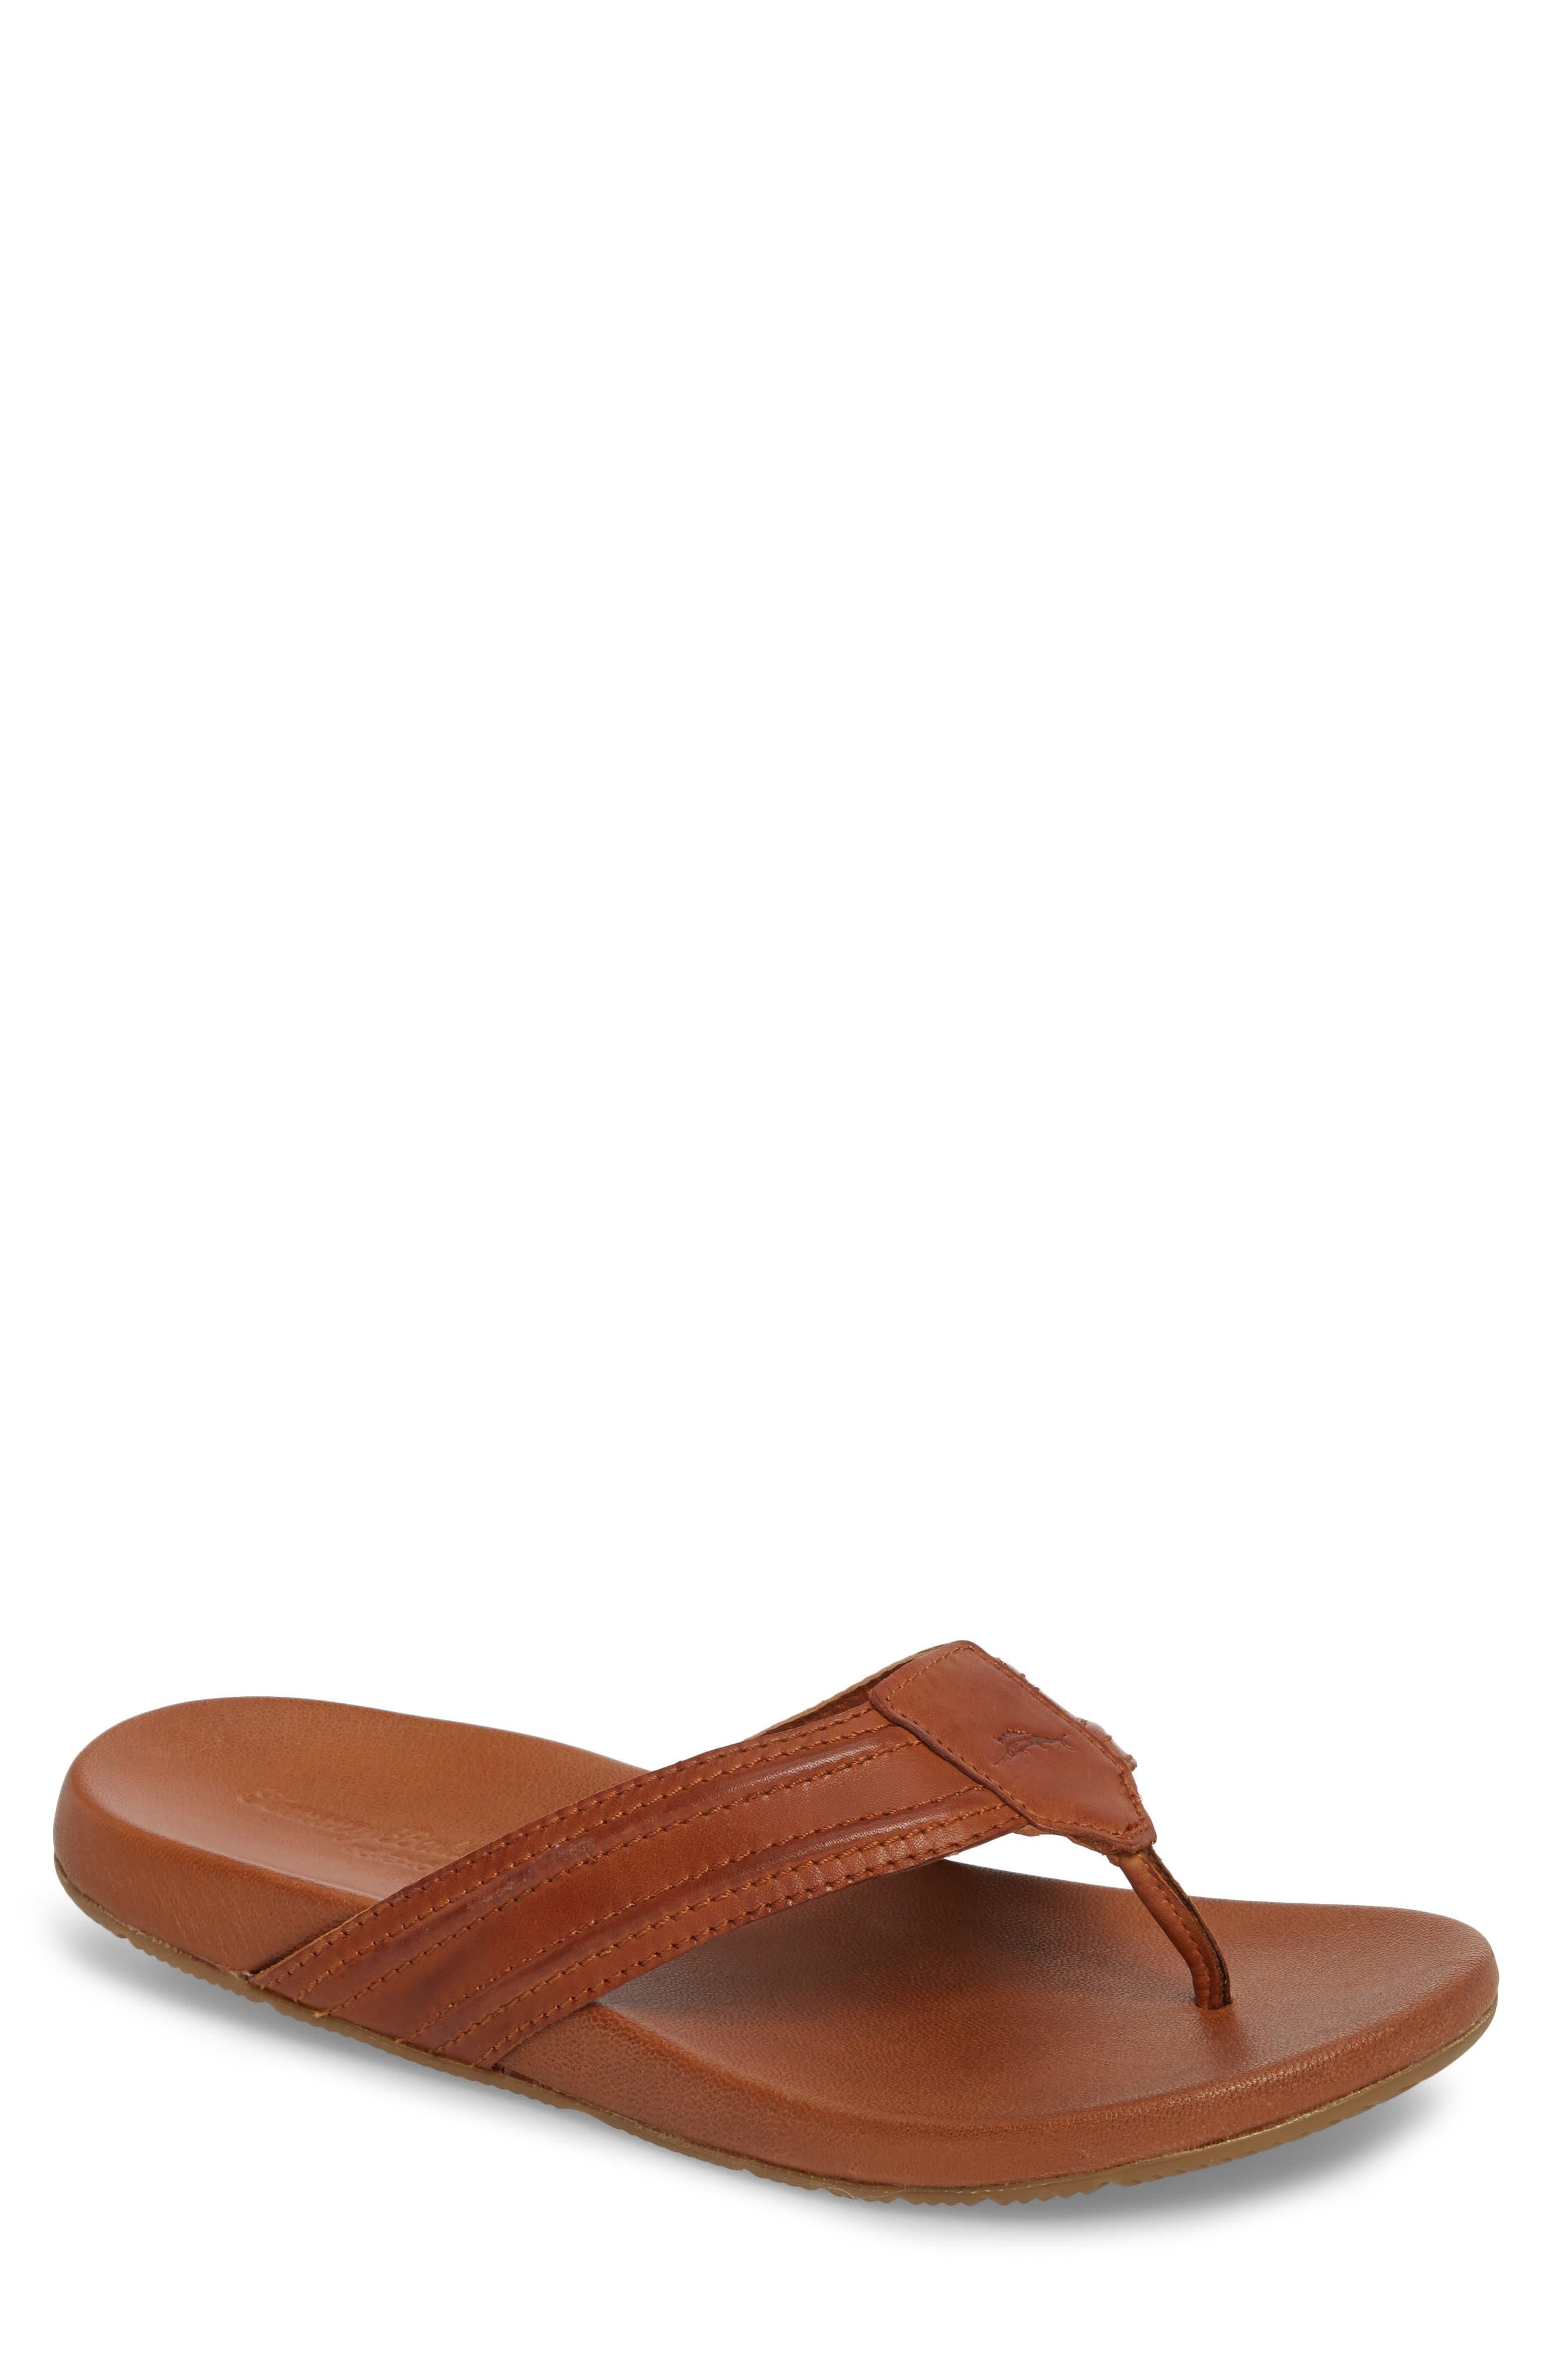 Mayaguana Flip Flop,                             Main thumbnail 1, color,                             Tan Leather